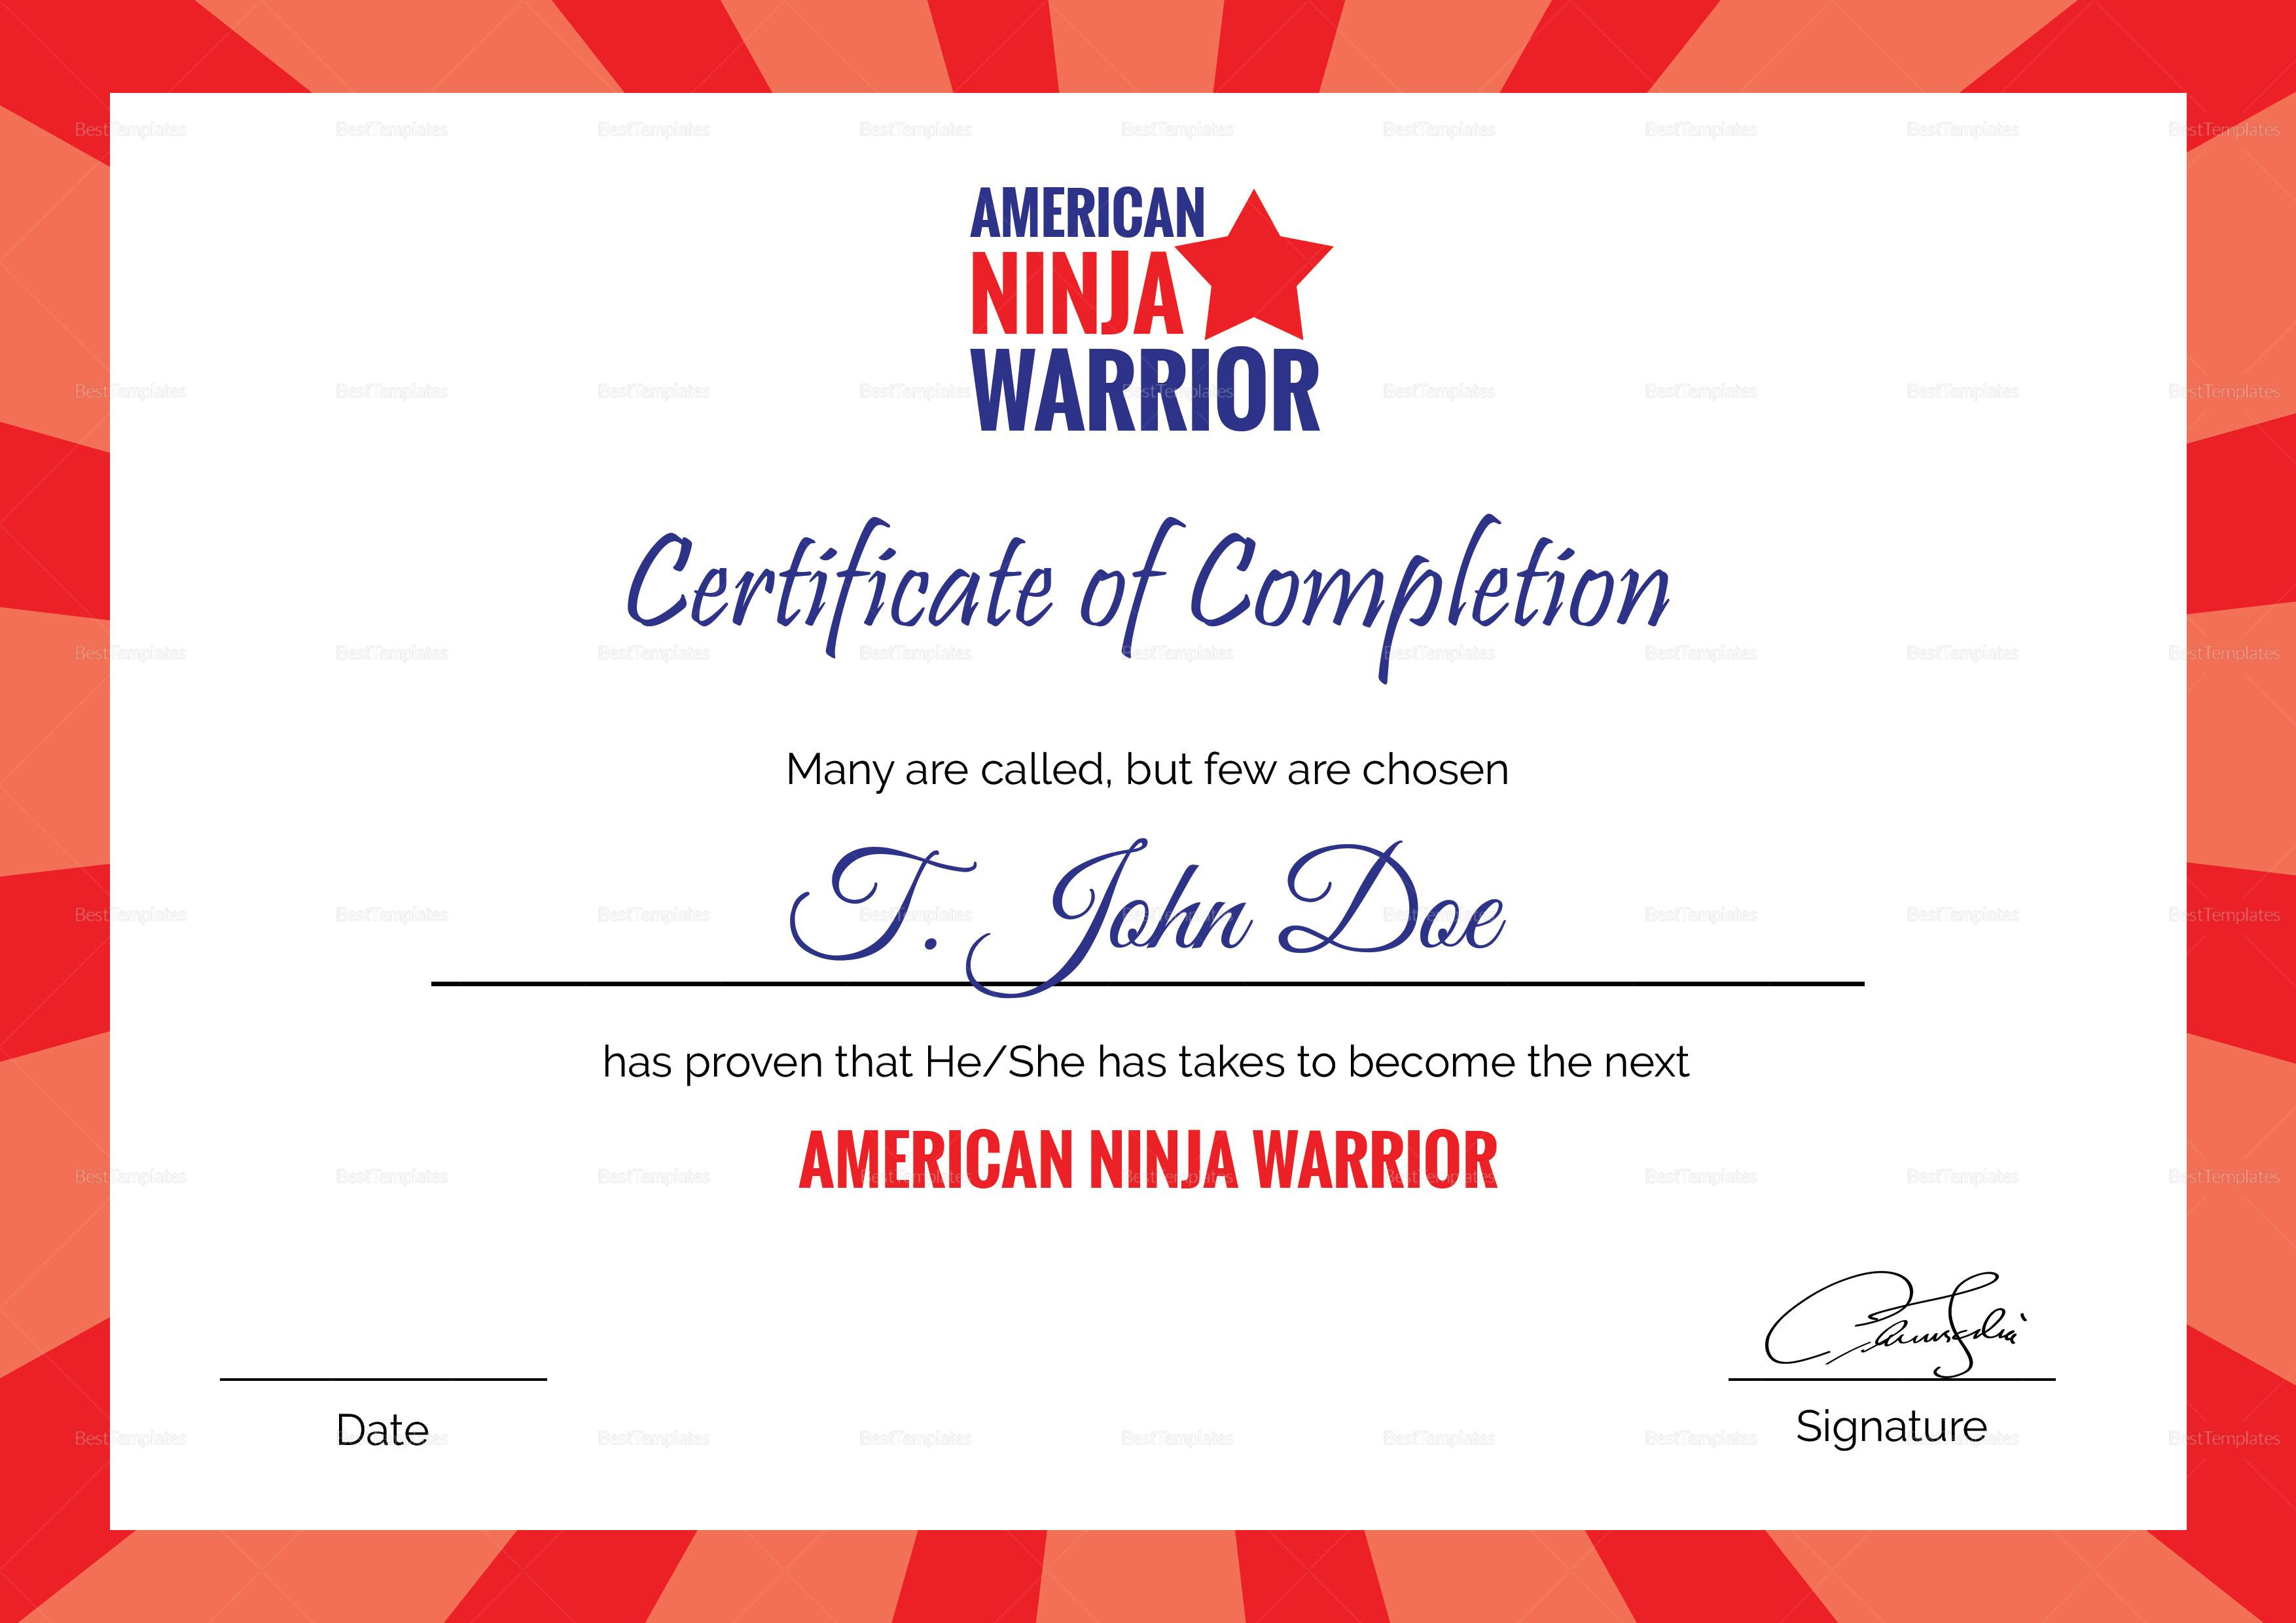 American Ninja Warrior Certificate of Completion